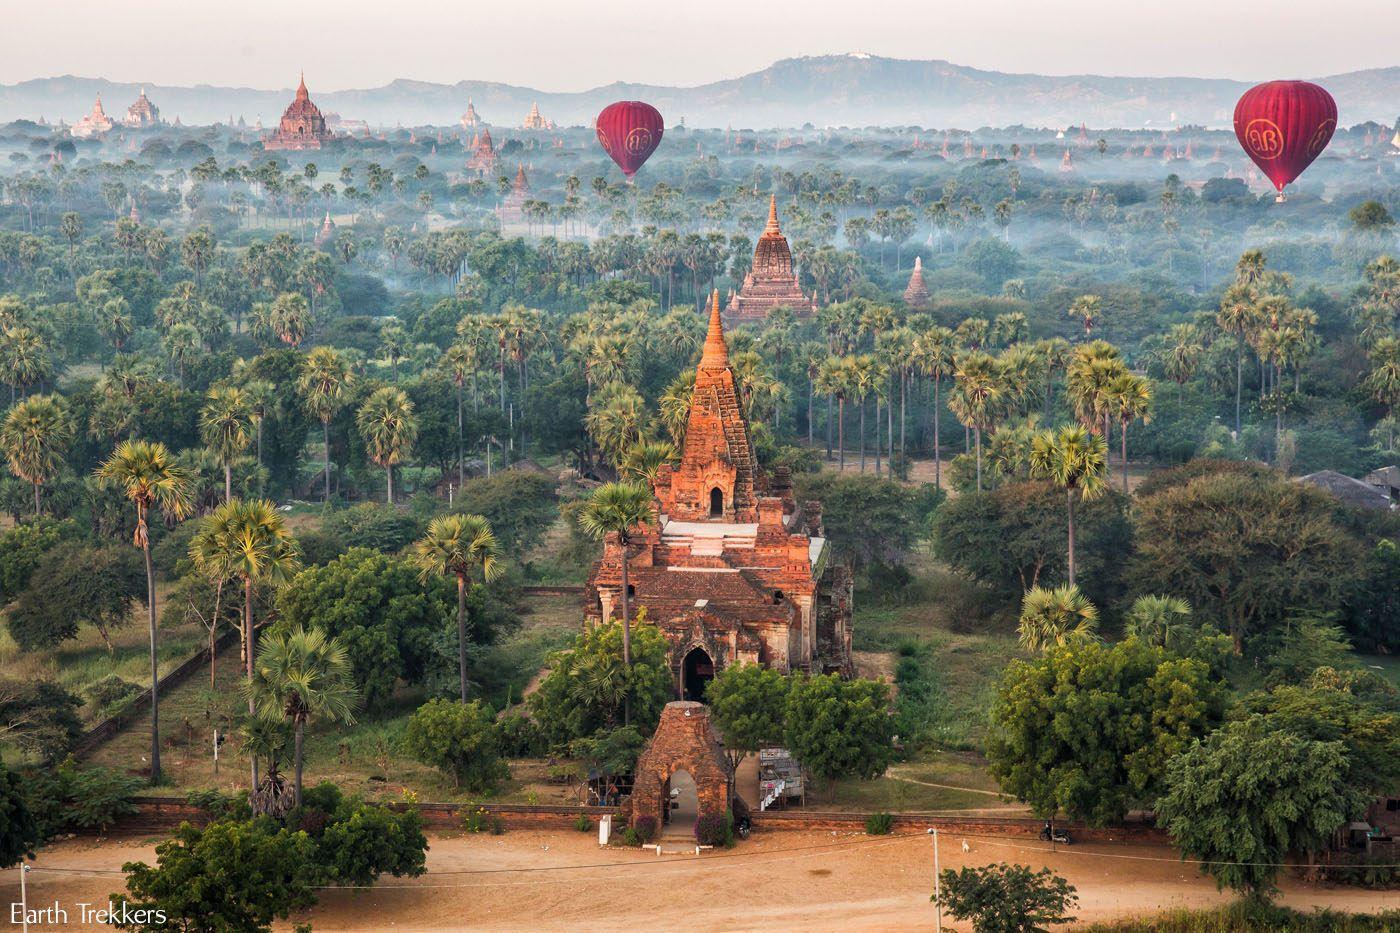 Bagan Balloons